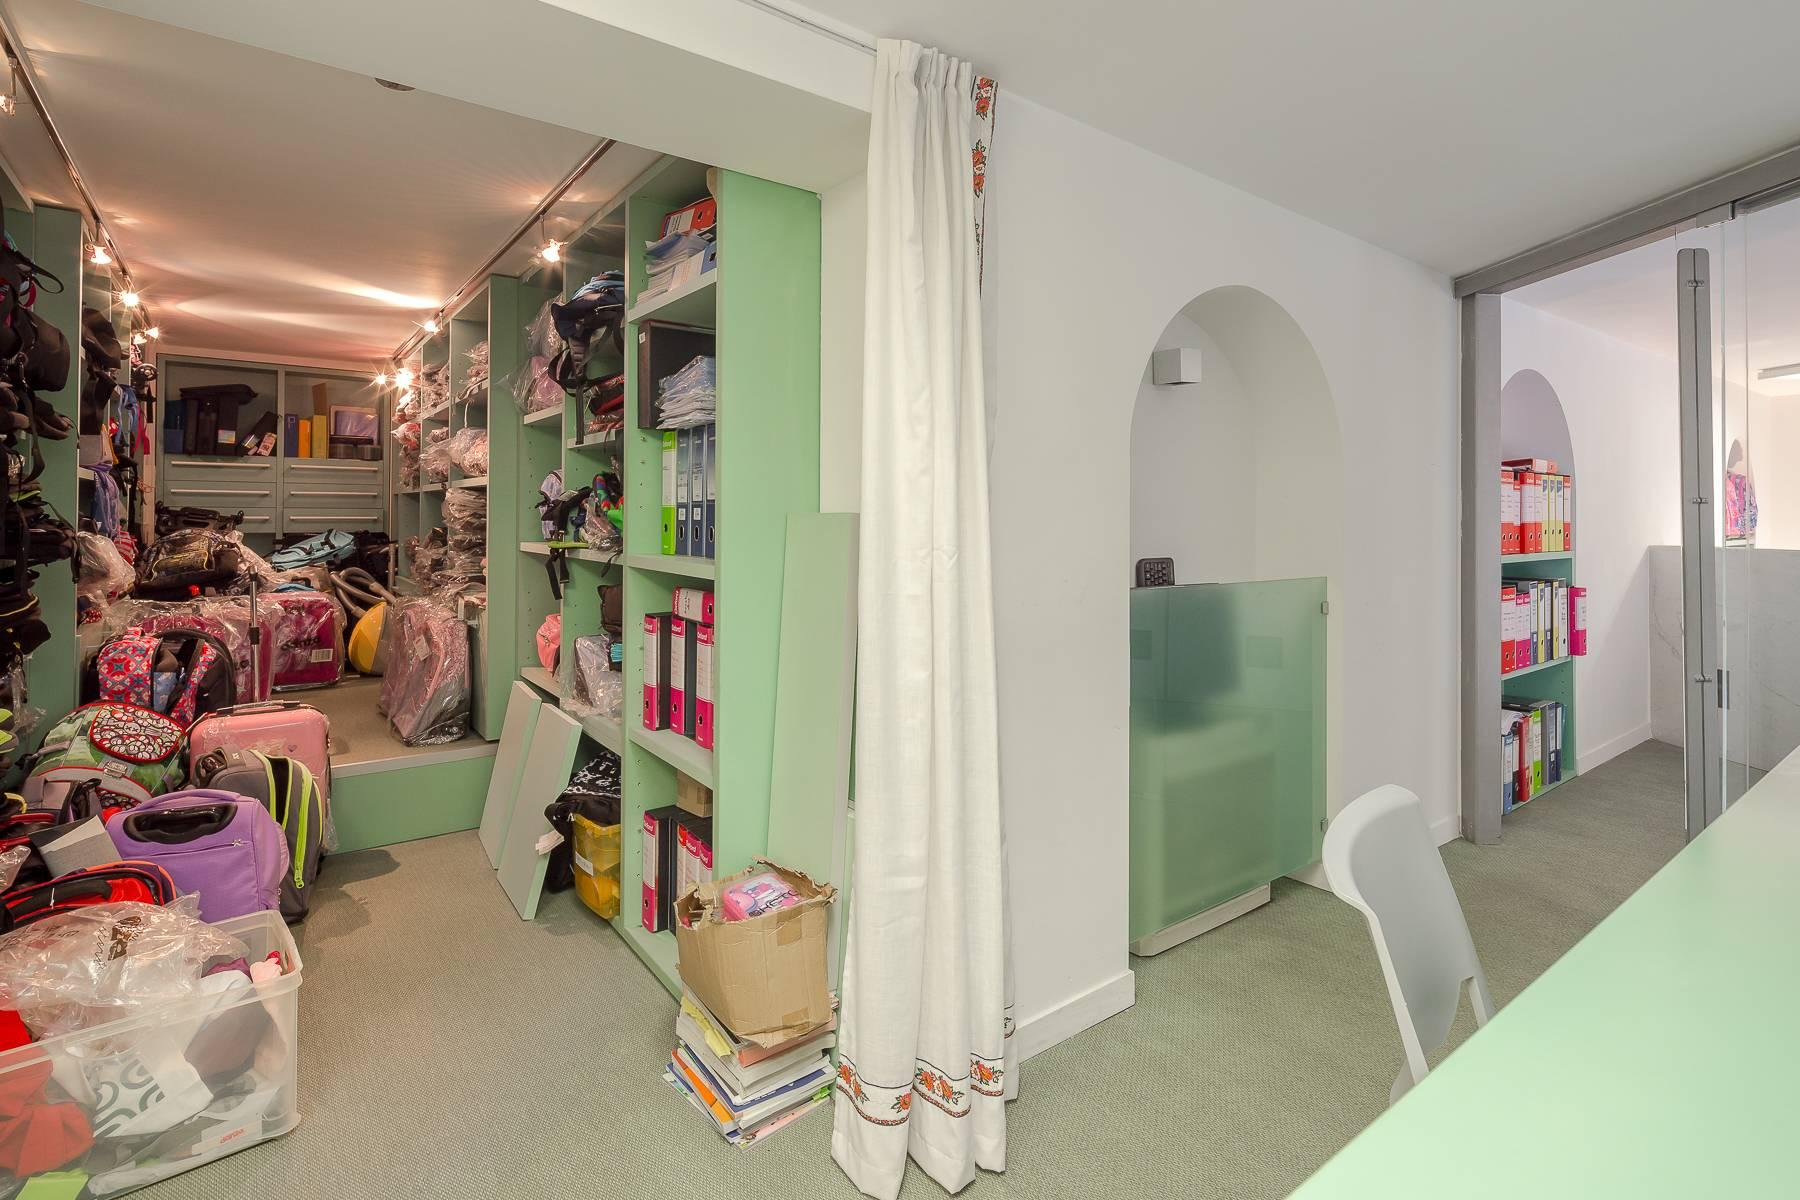 Open space office/residential property in Piazza Giovine Italia/Via Aurelio Saffi - 14